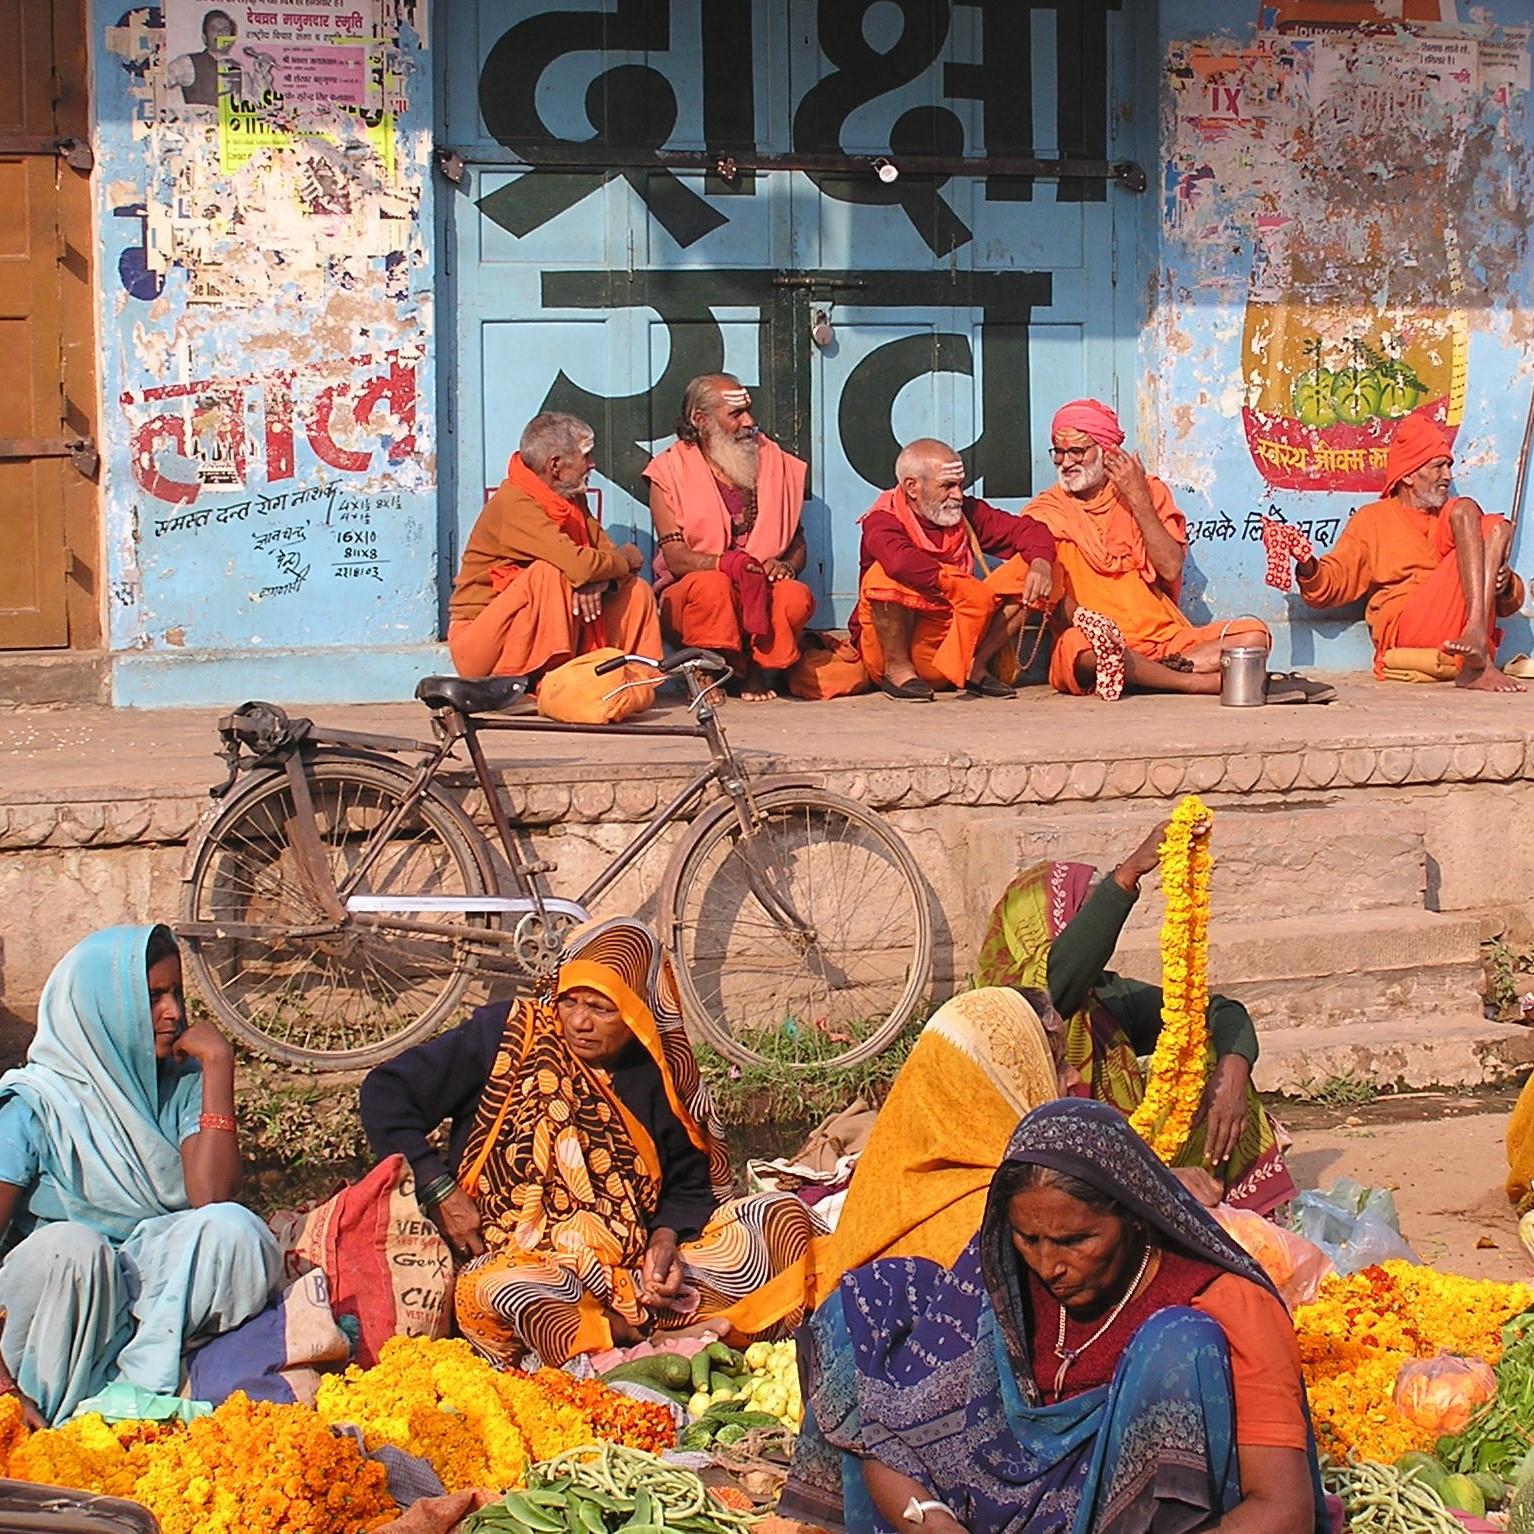 Noord-India foto's